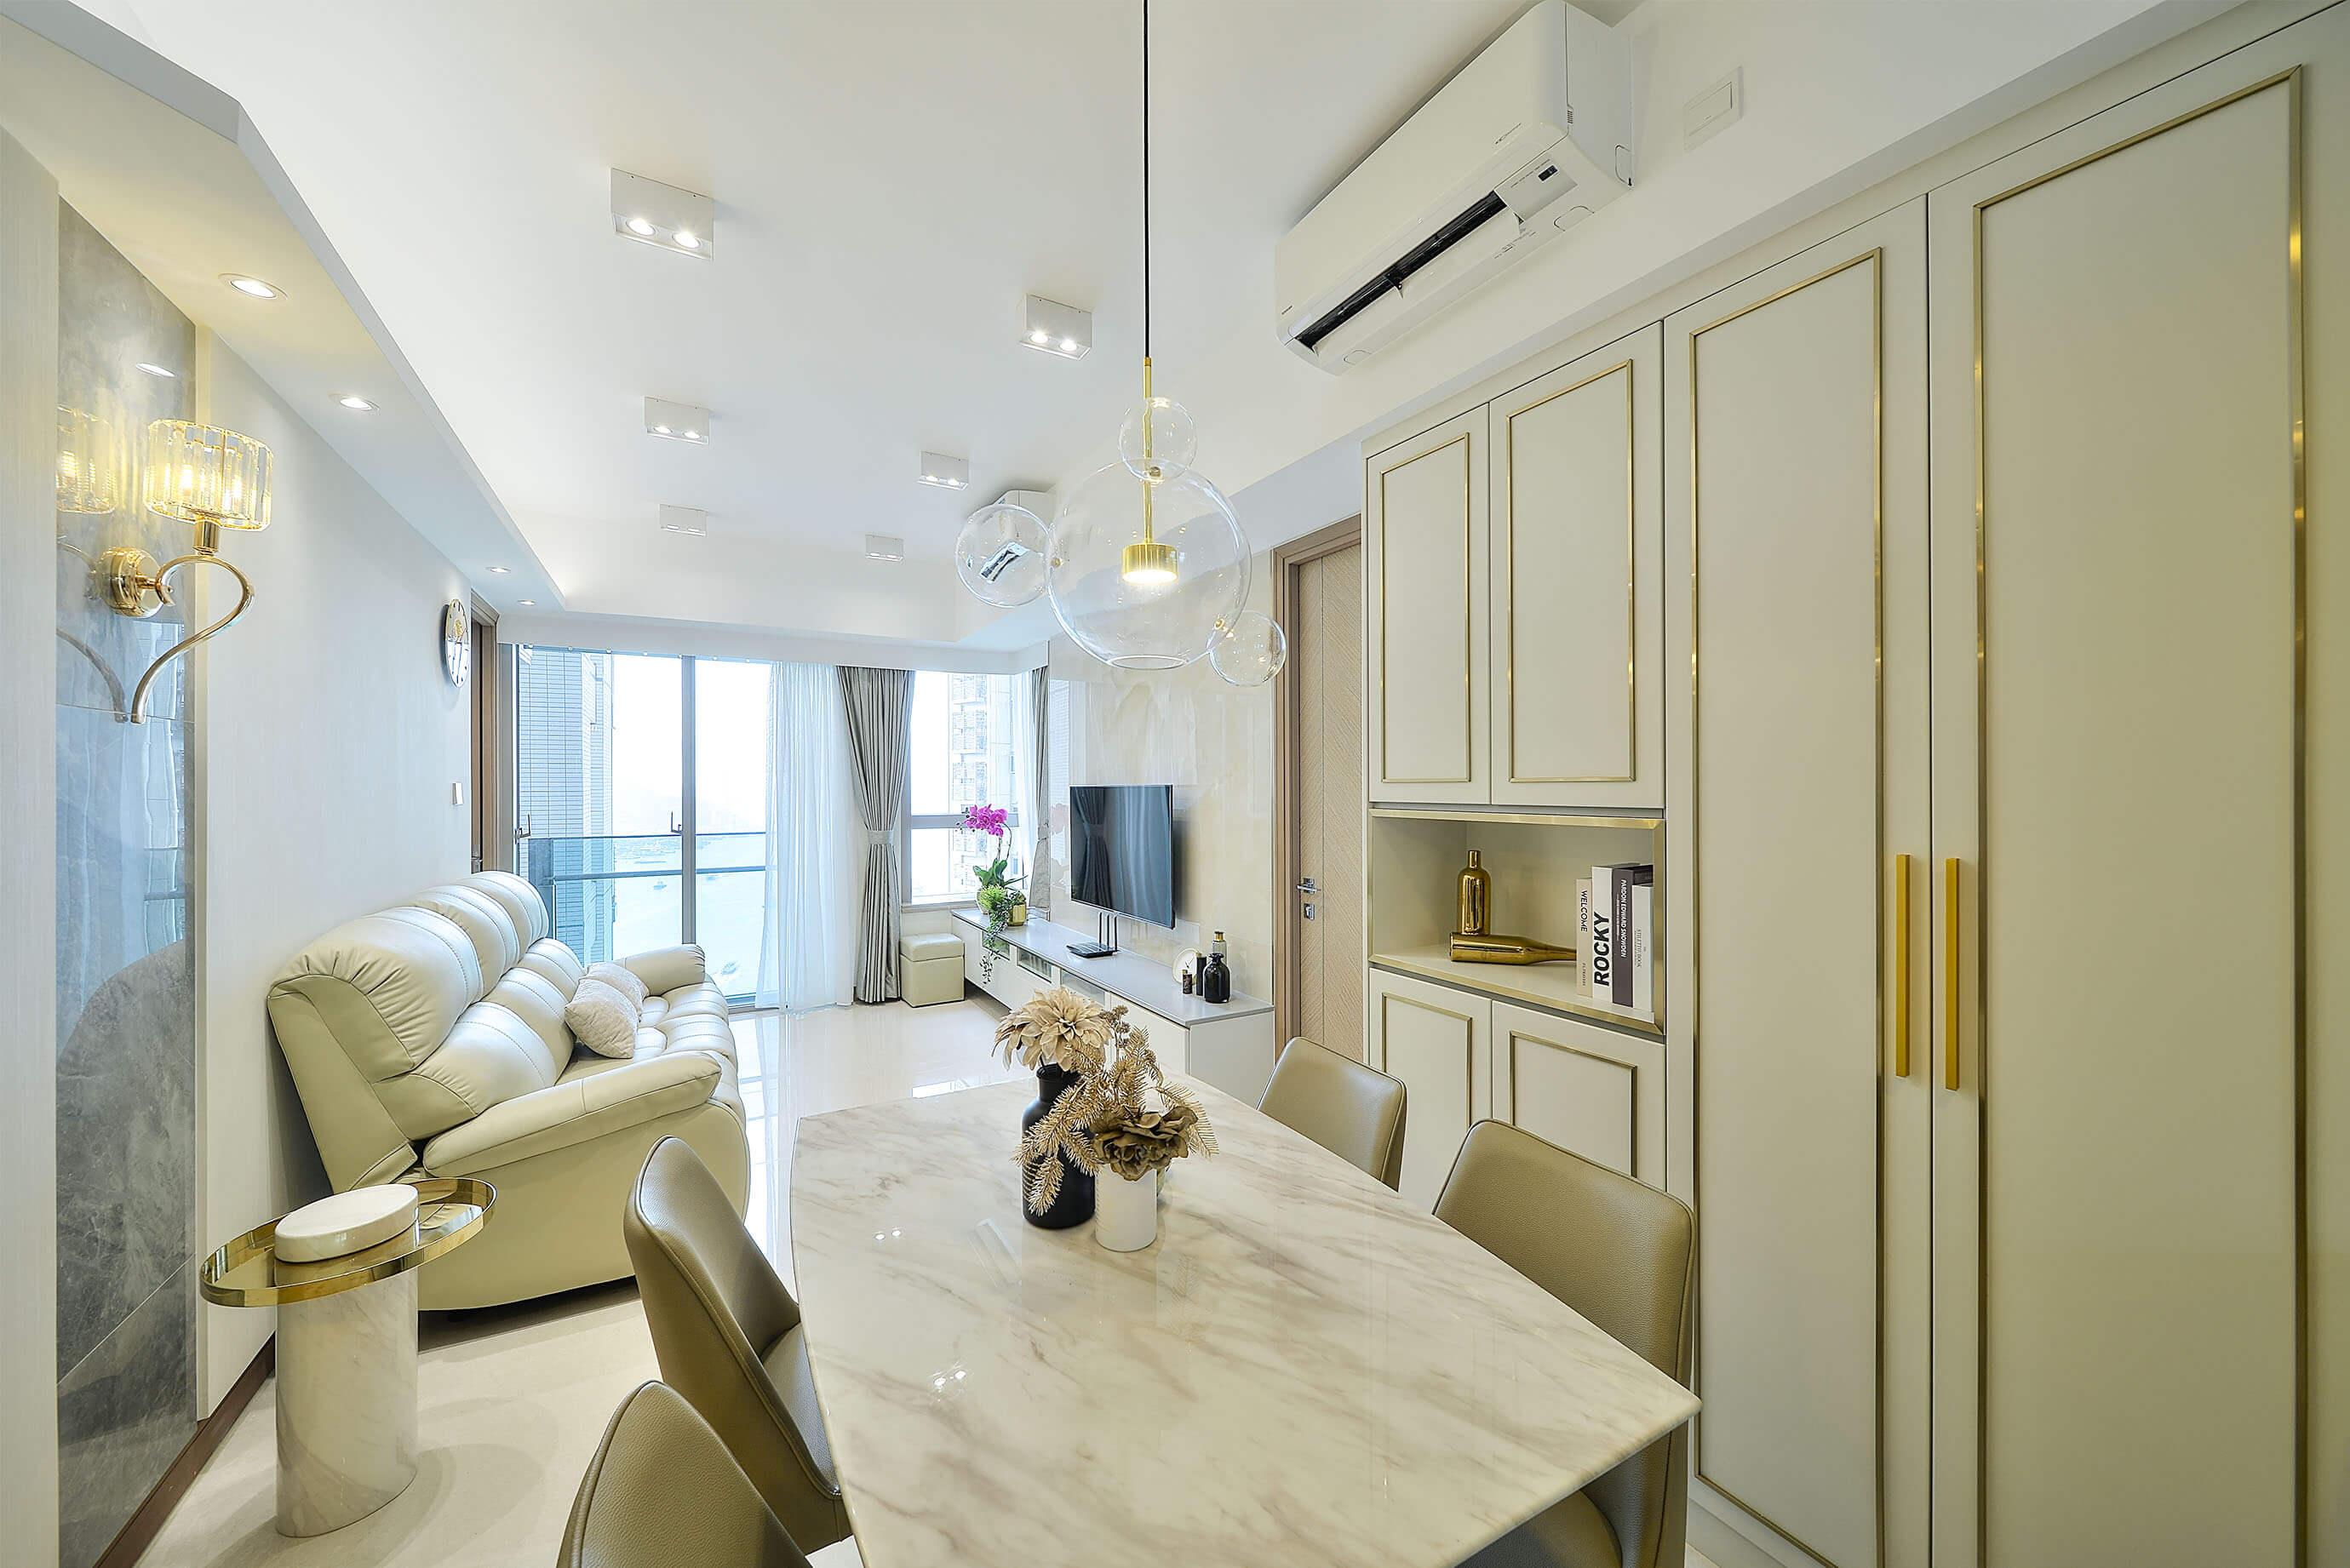 5e54f969a861a02f84feaef2_inch-interior-design-hong-kong-home-slide-012